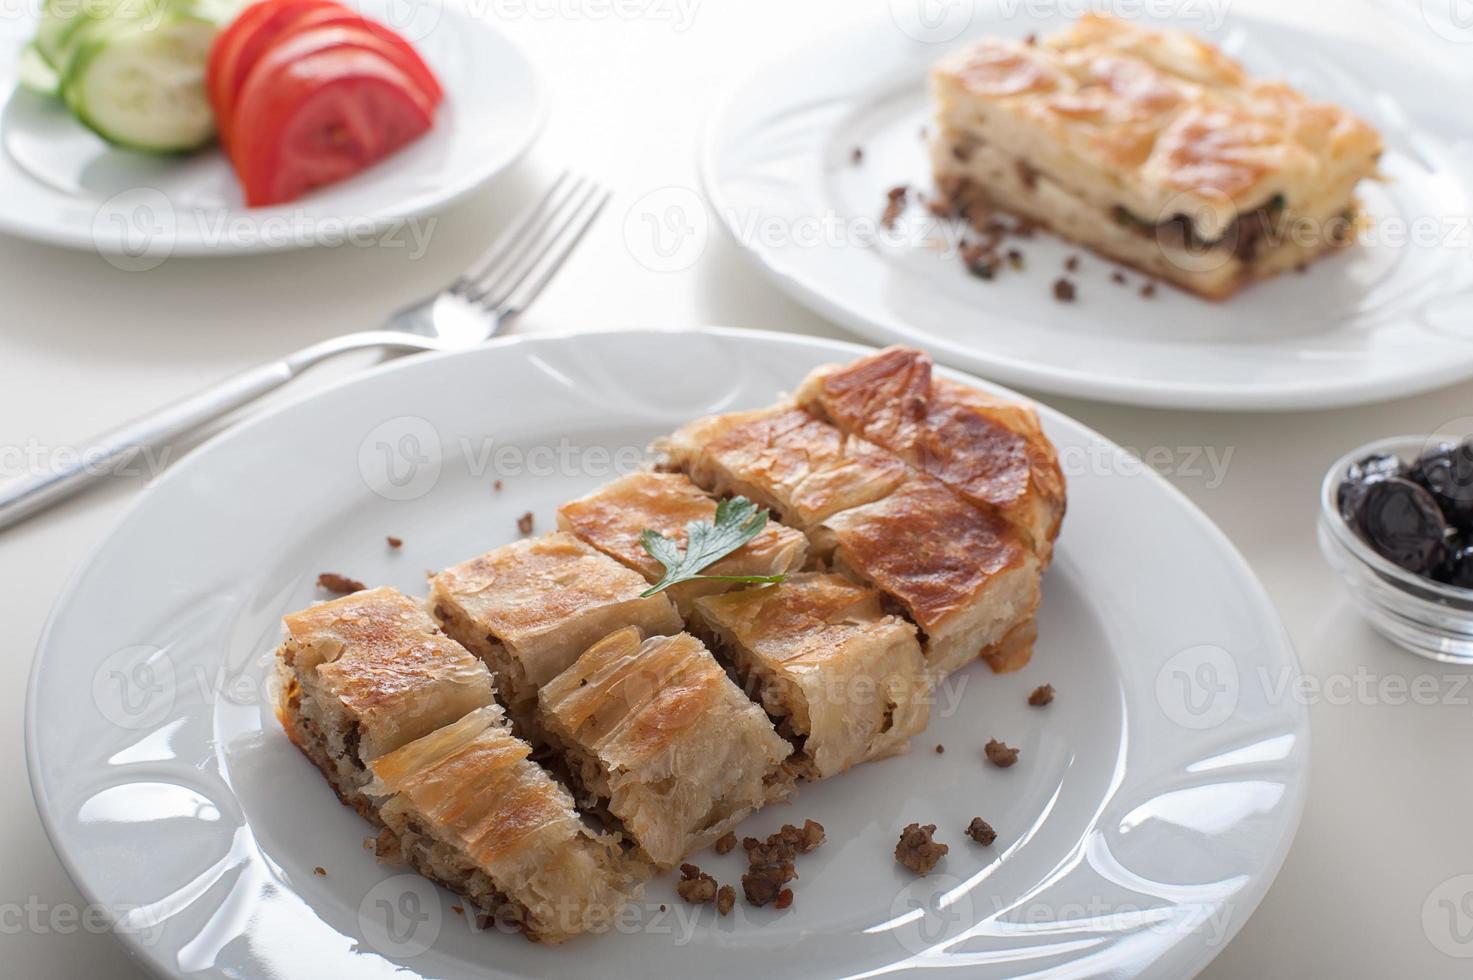 pequeno-almoço turco borek foto